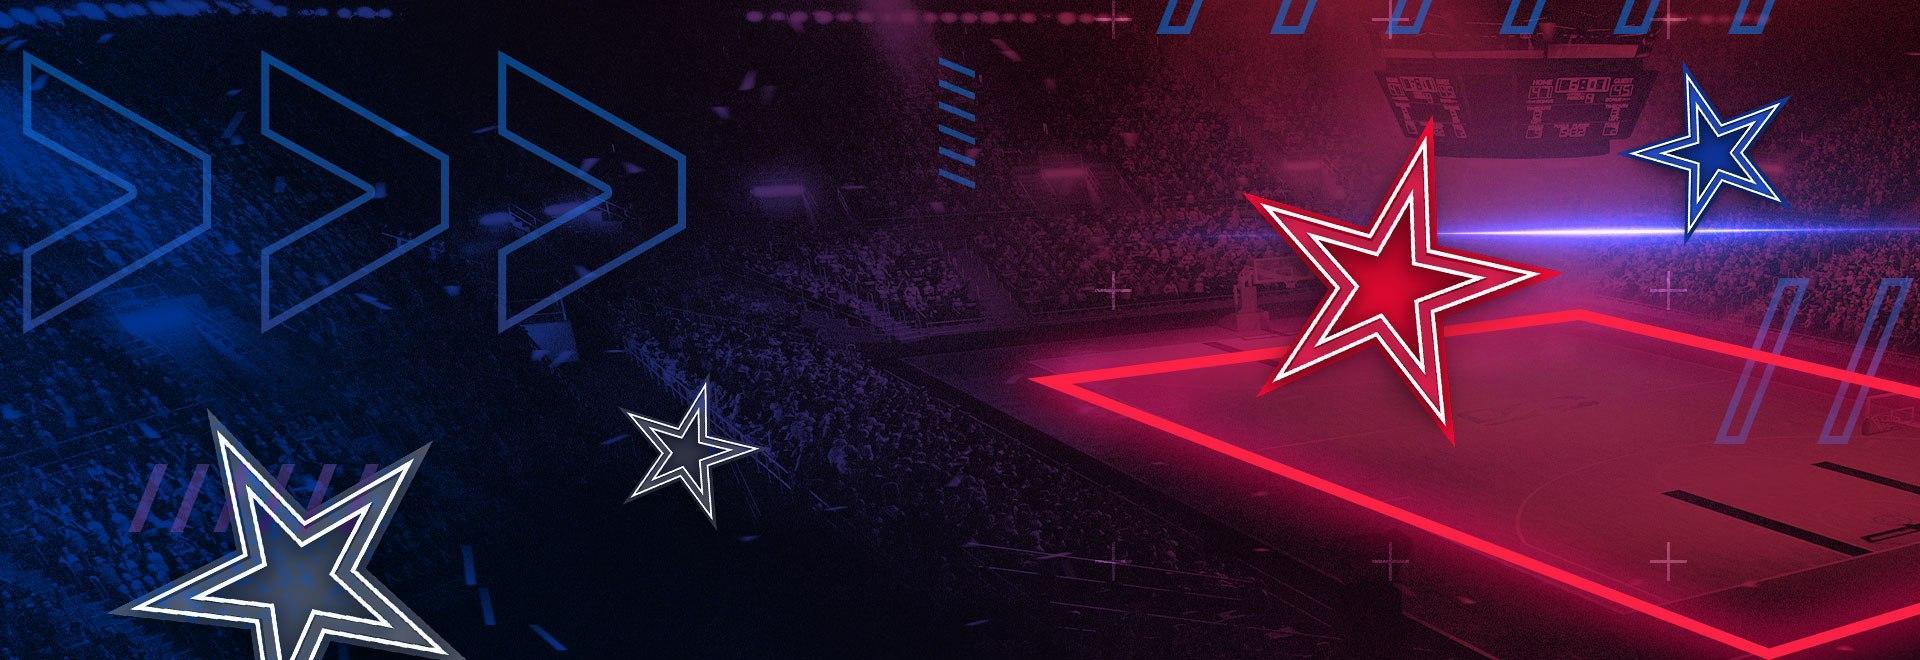 NBA All Star Game 2011